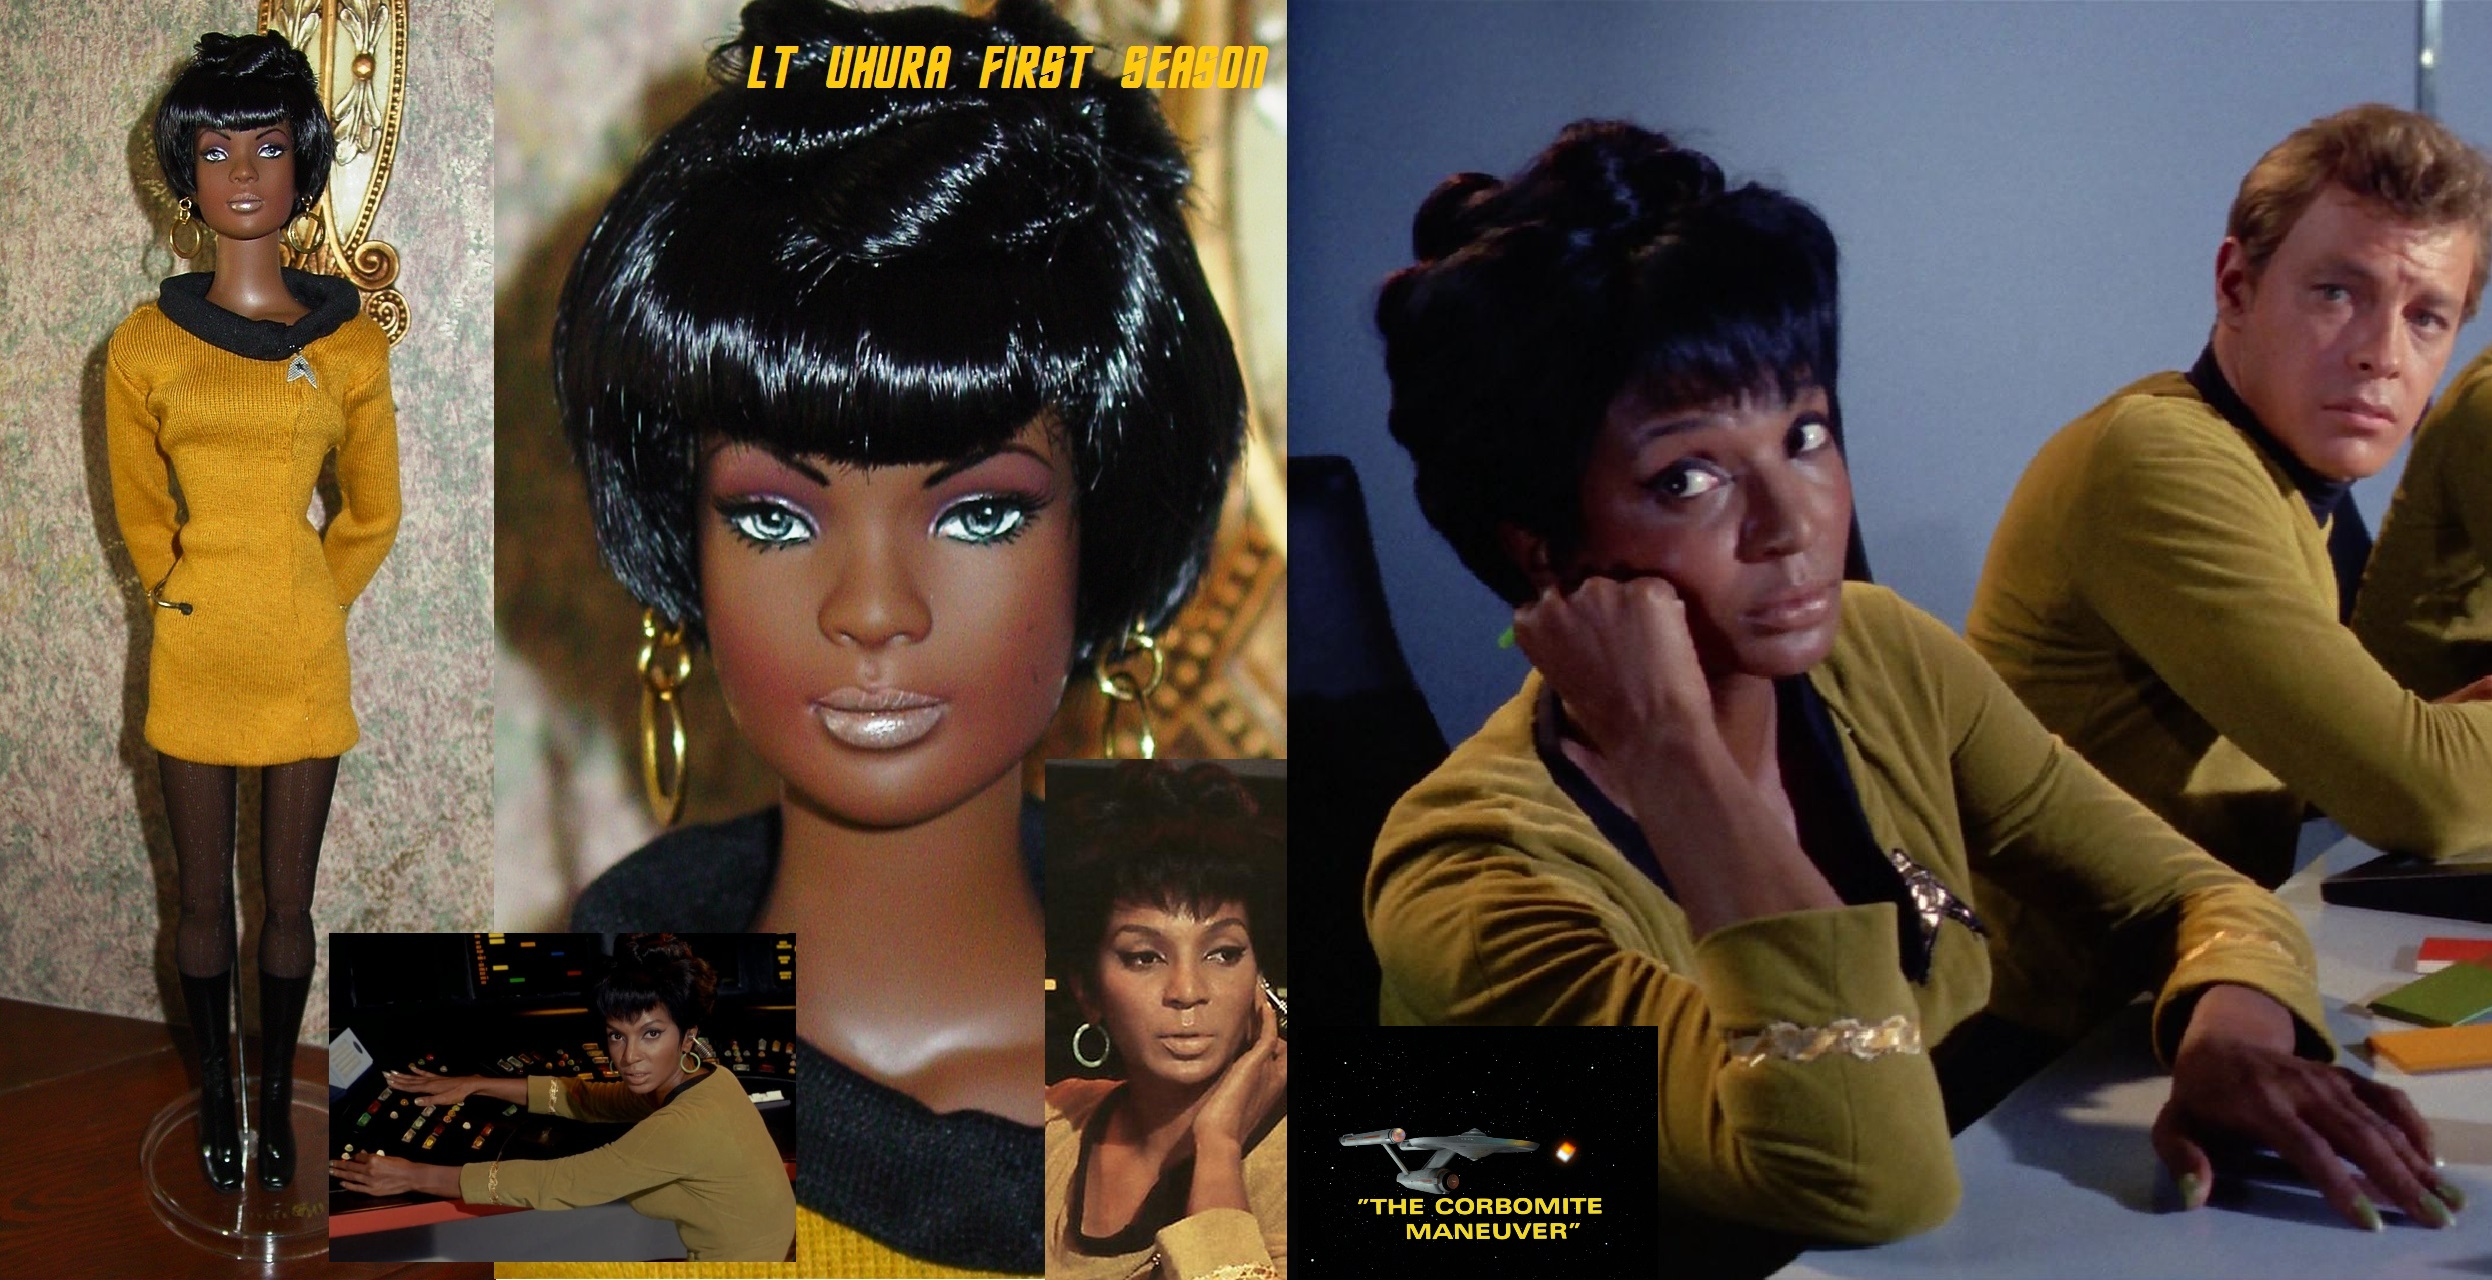 Lt. Uhura Season 1